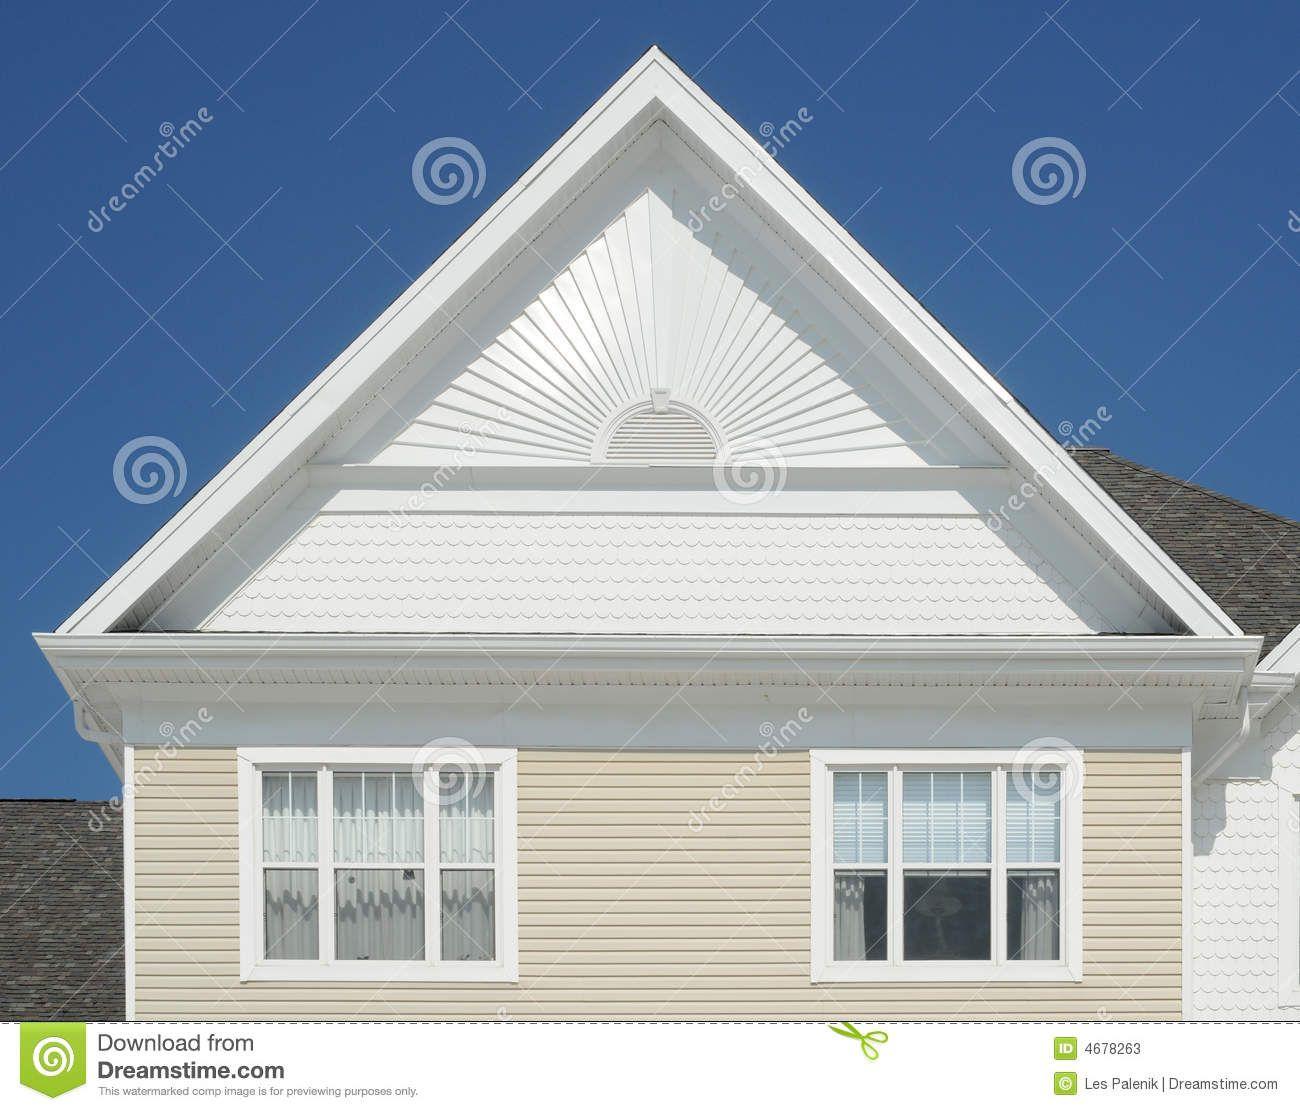 Image Result For Gable Shake Siding Exterior Siding Exterior Wood Siding Colors Wood Siding Exterior